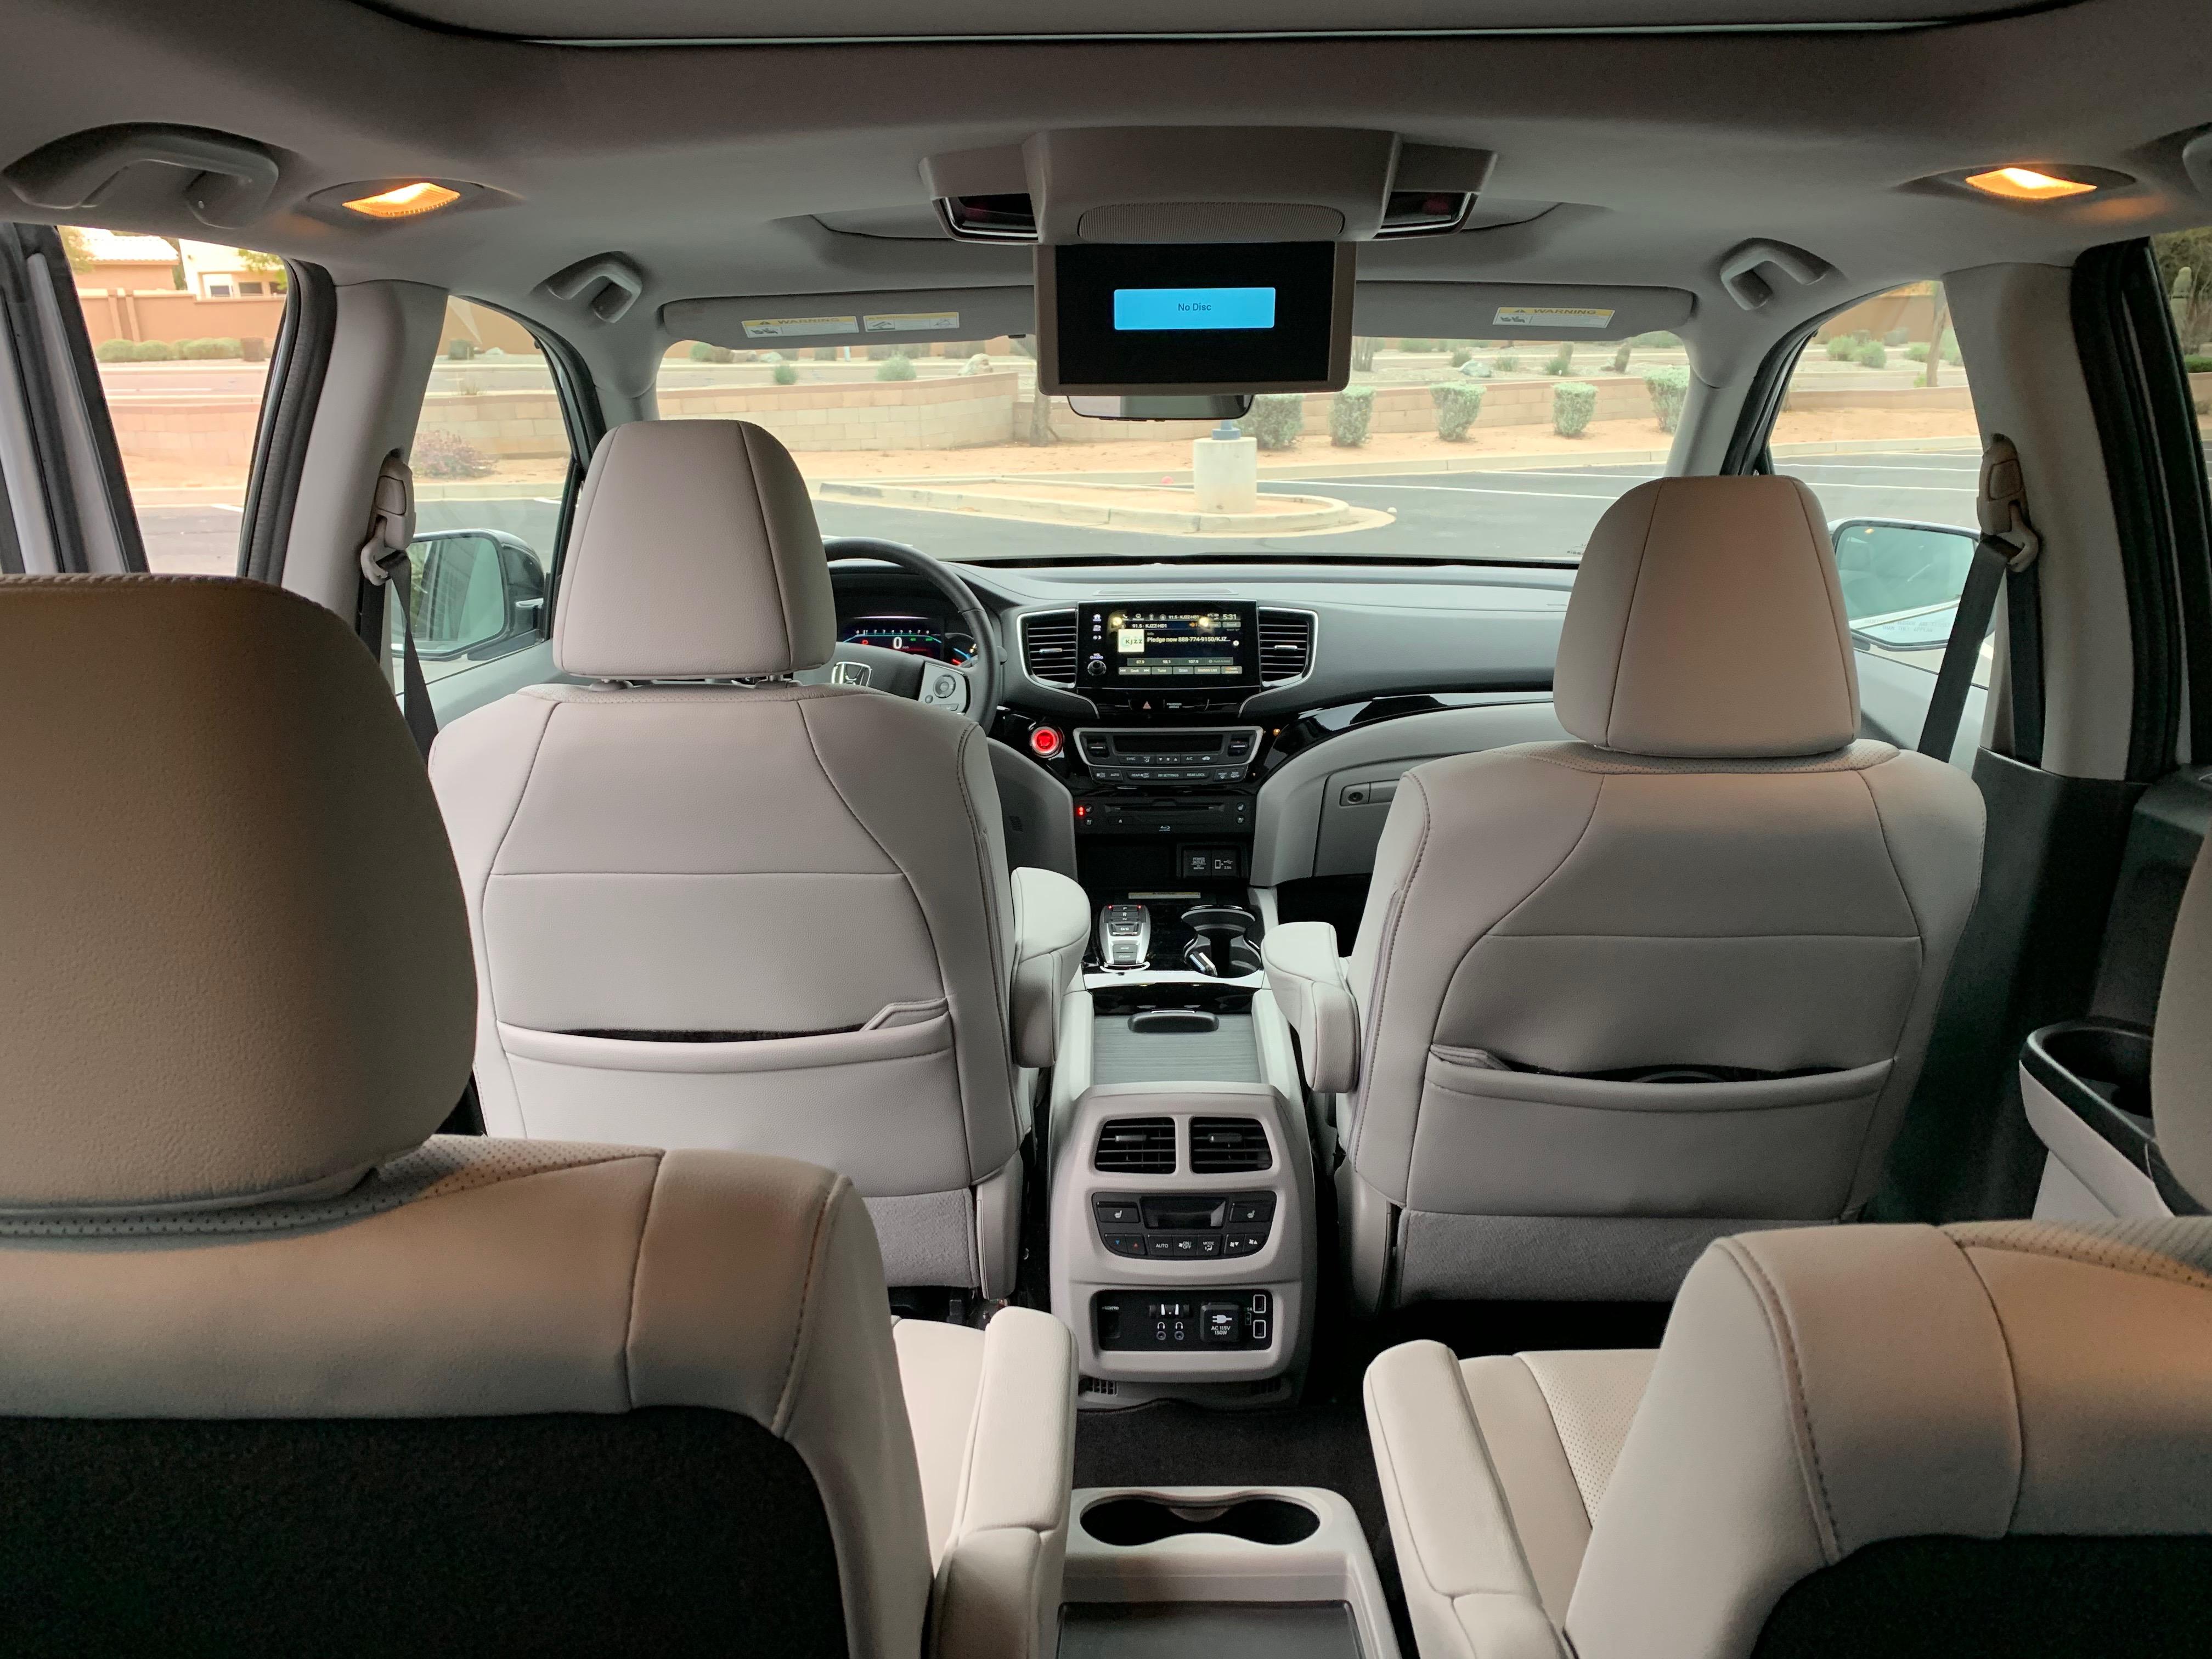 Honda Pilot, New Honda Pilot boasts all-day road trip comfort, ClassicCars.com Journal